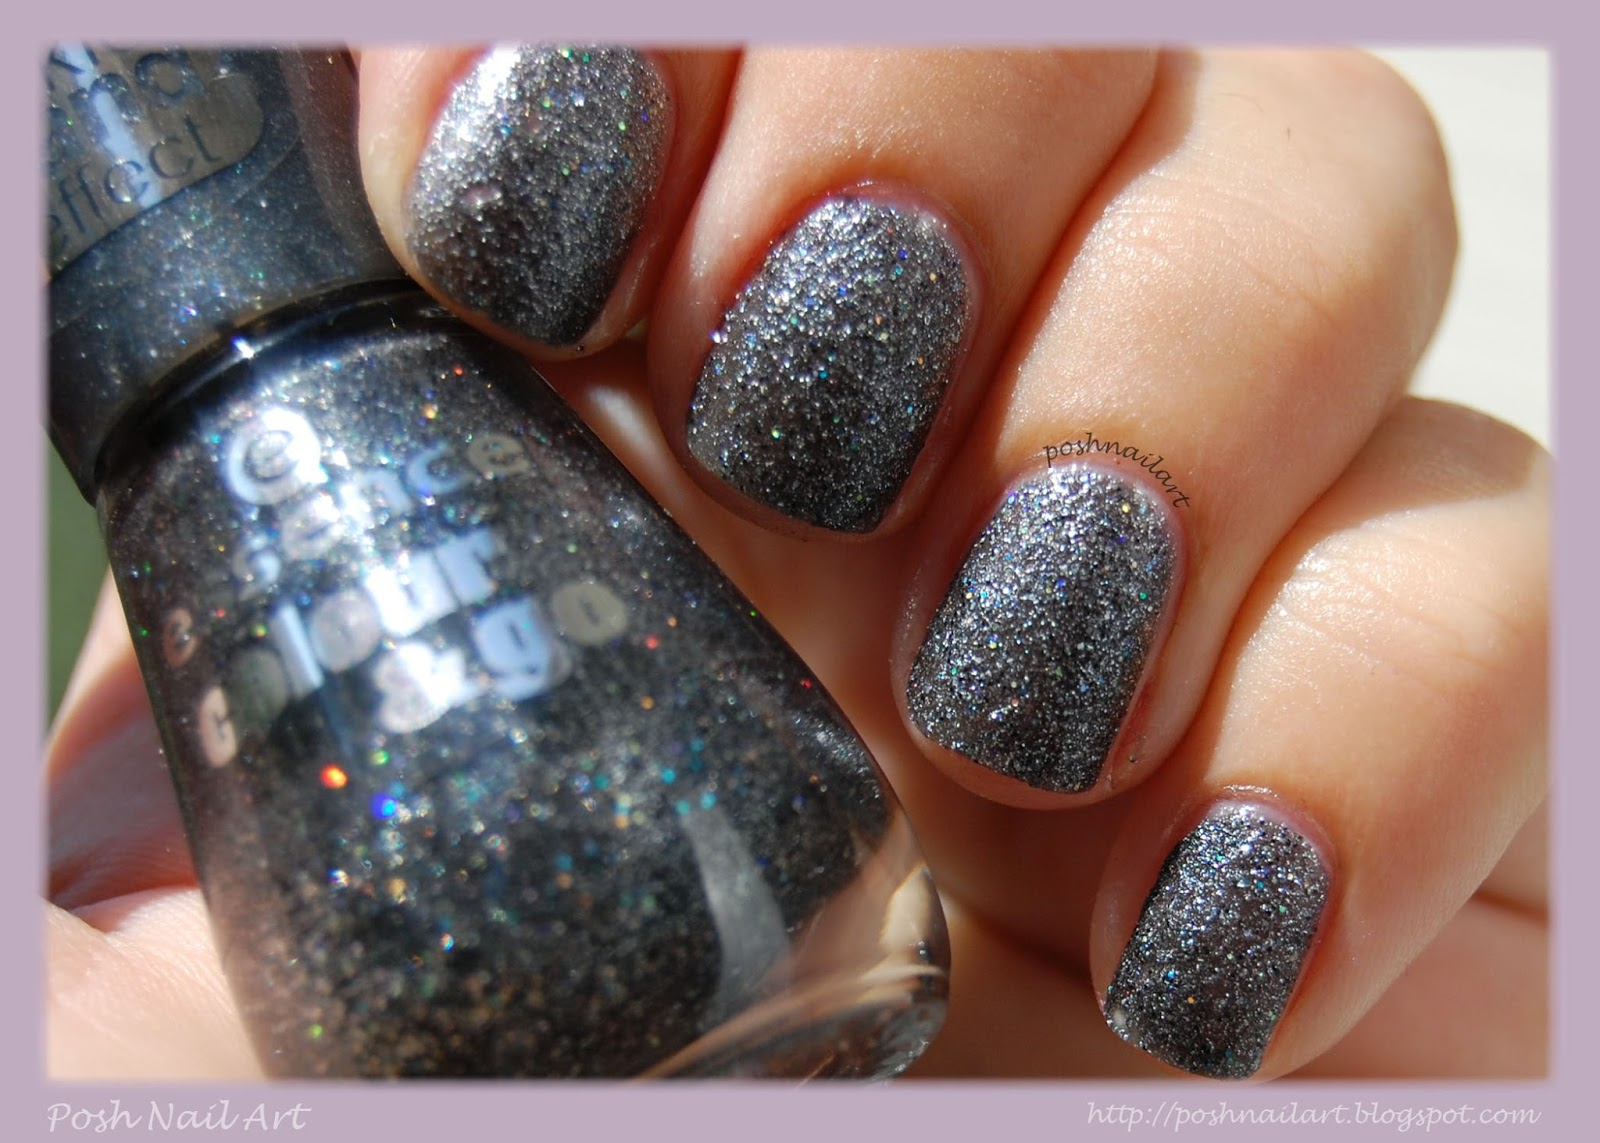 Posh Nail Art: Essence Sparkle Sand Effect